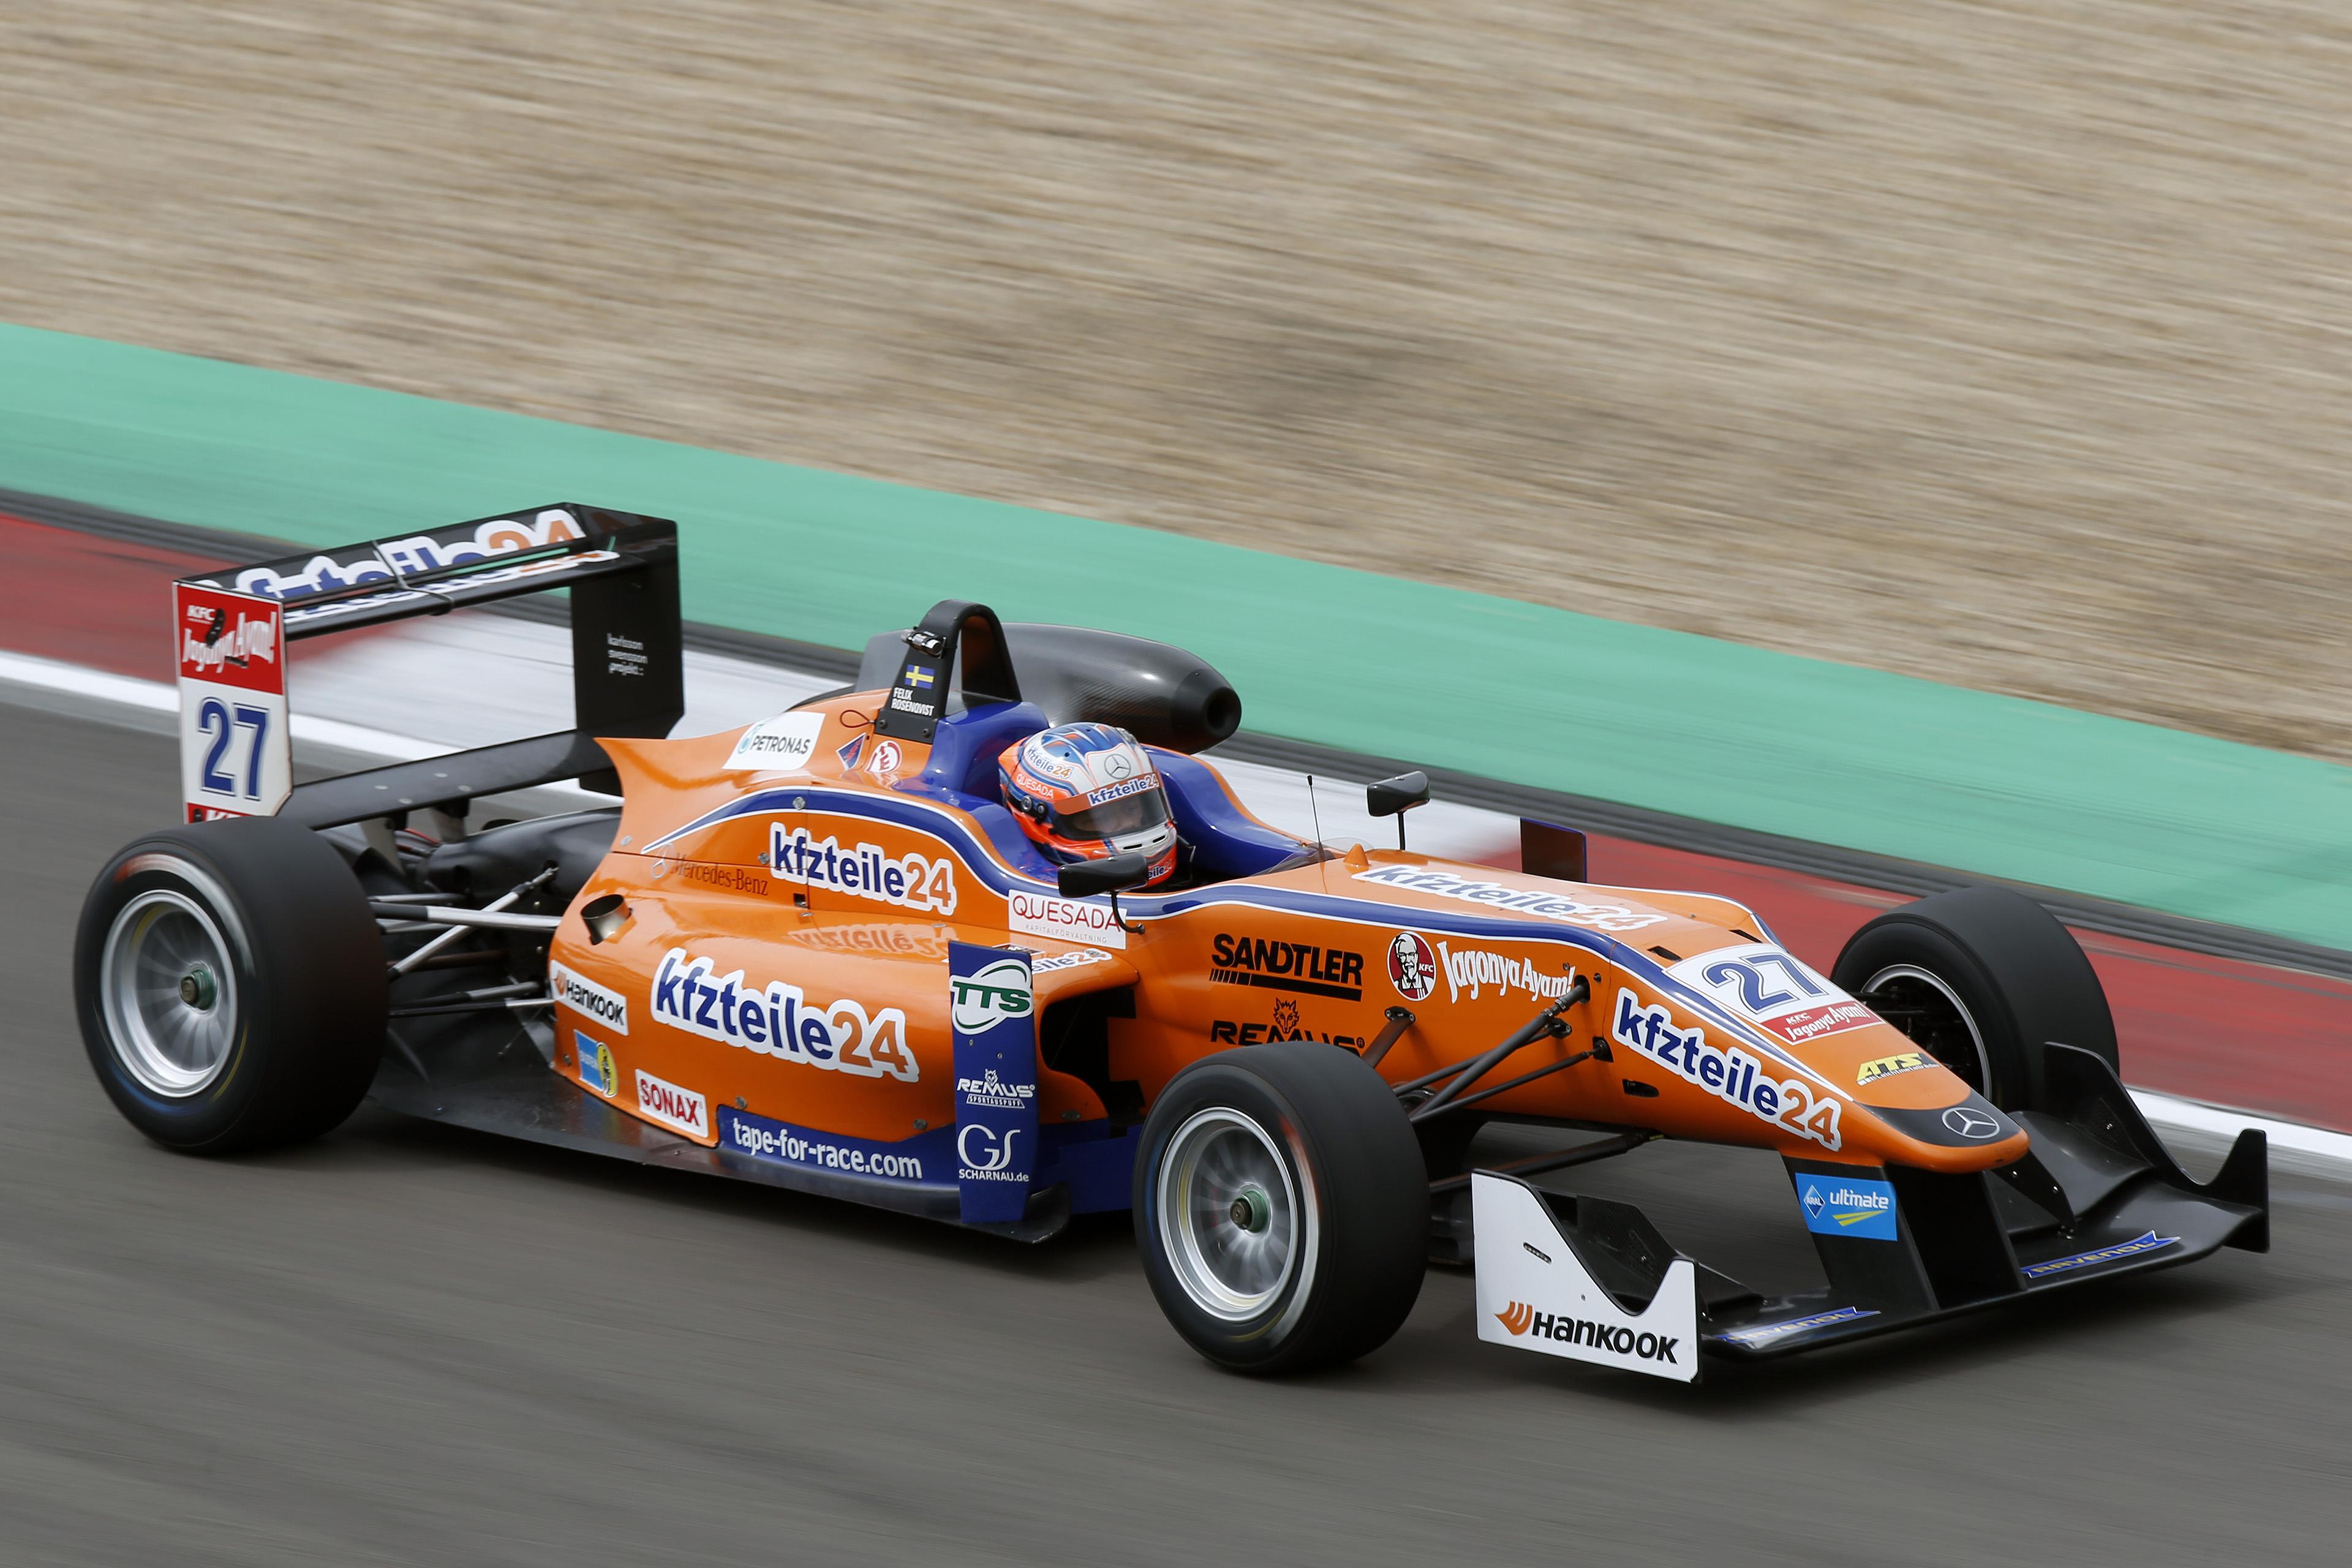 FIA Formula 3 European Championship, round 9, Nürburgring (GER)